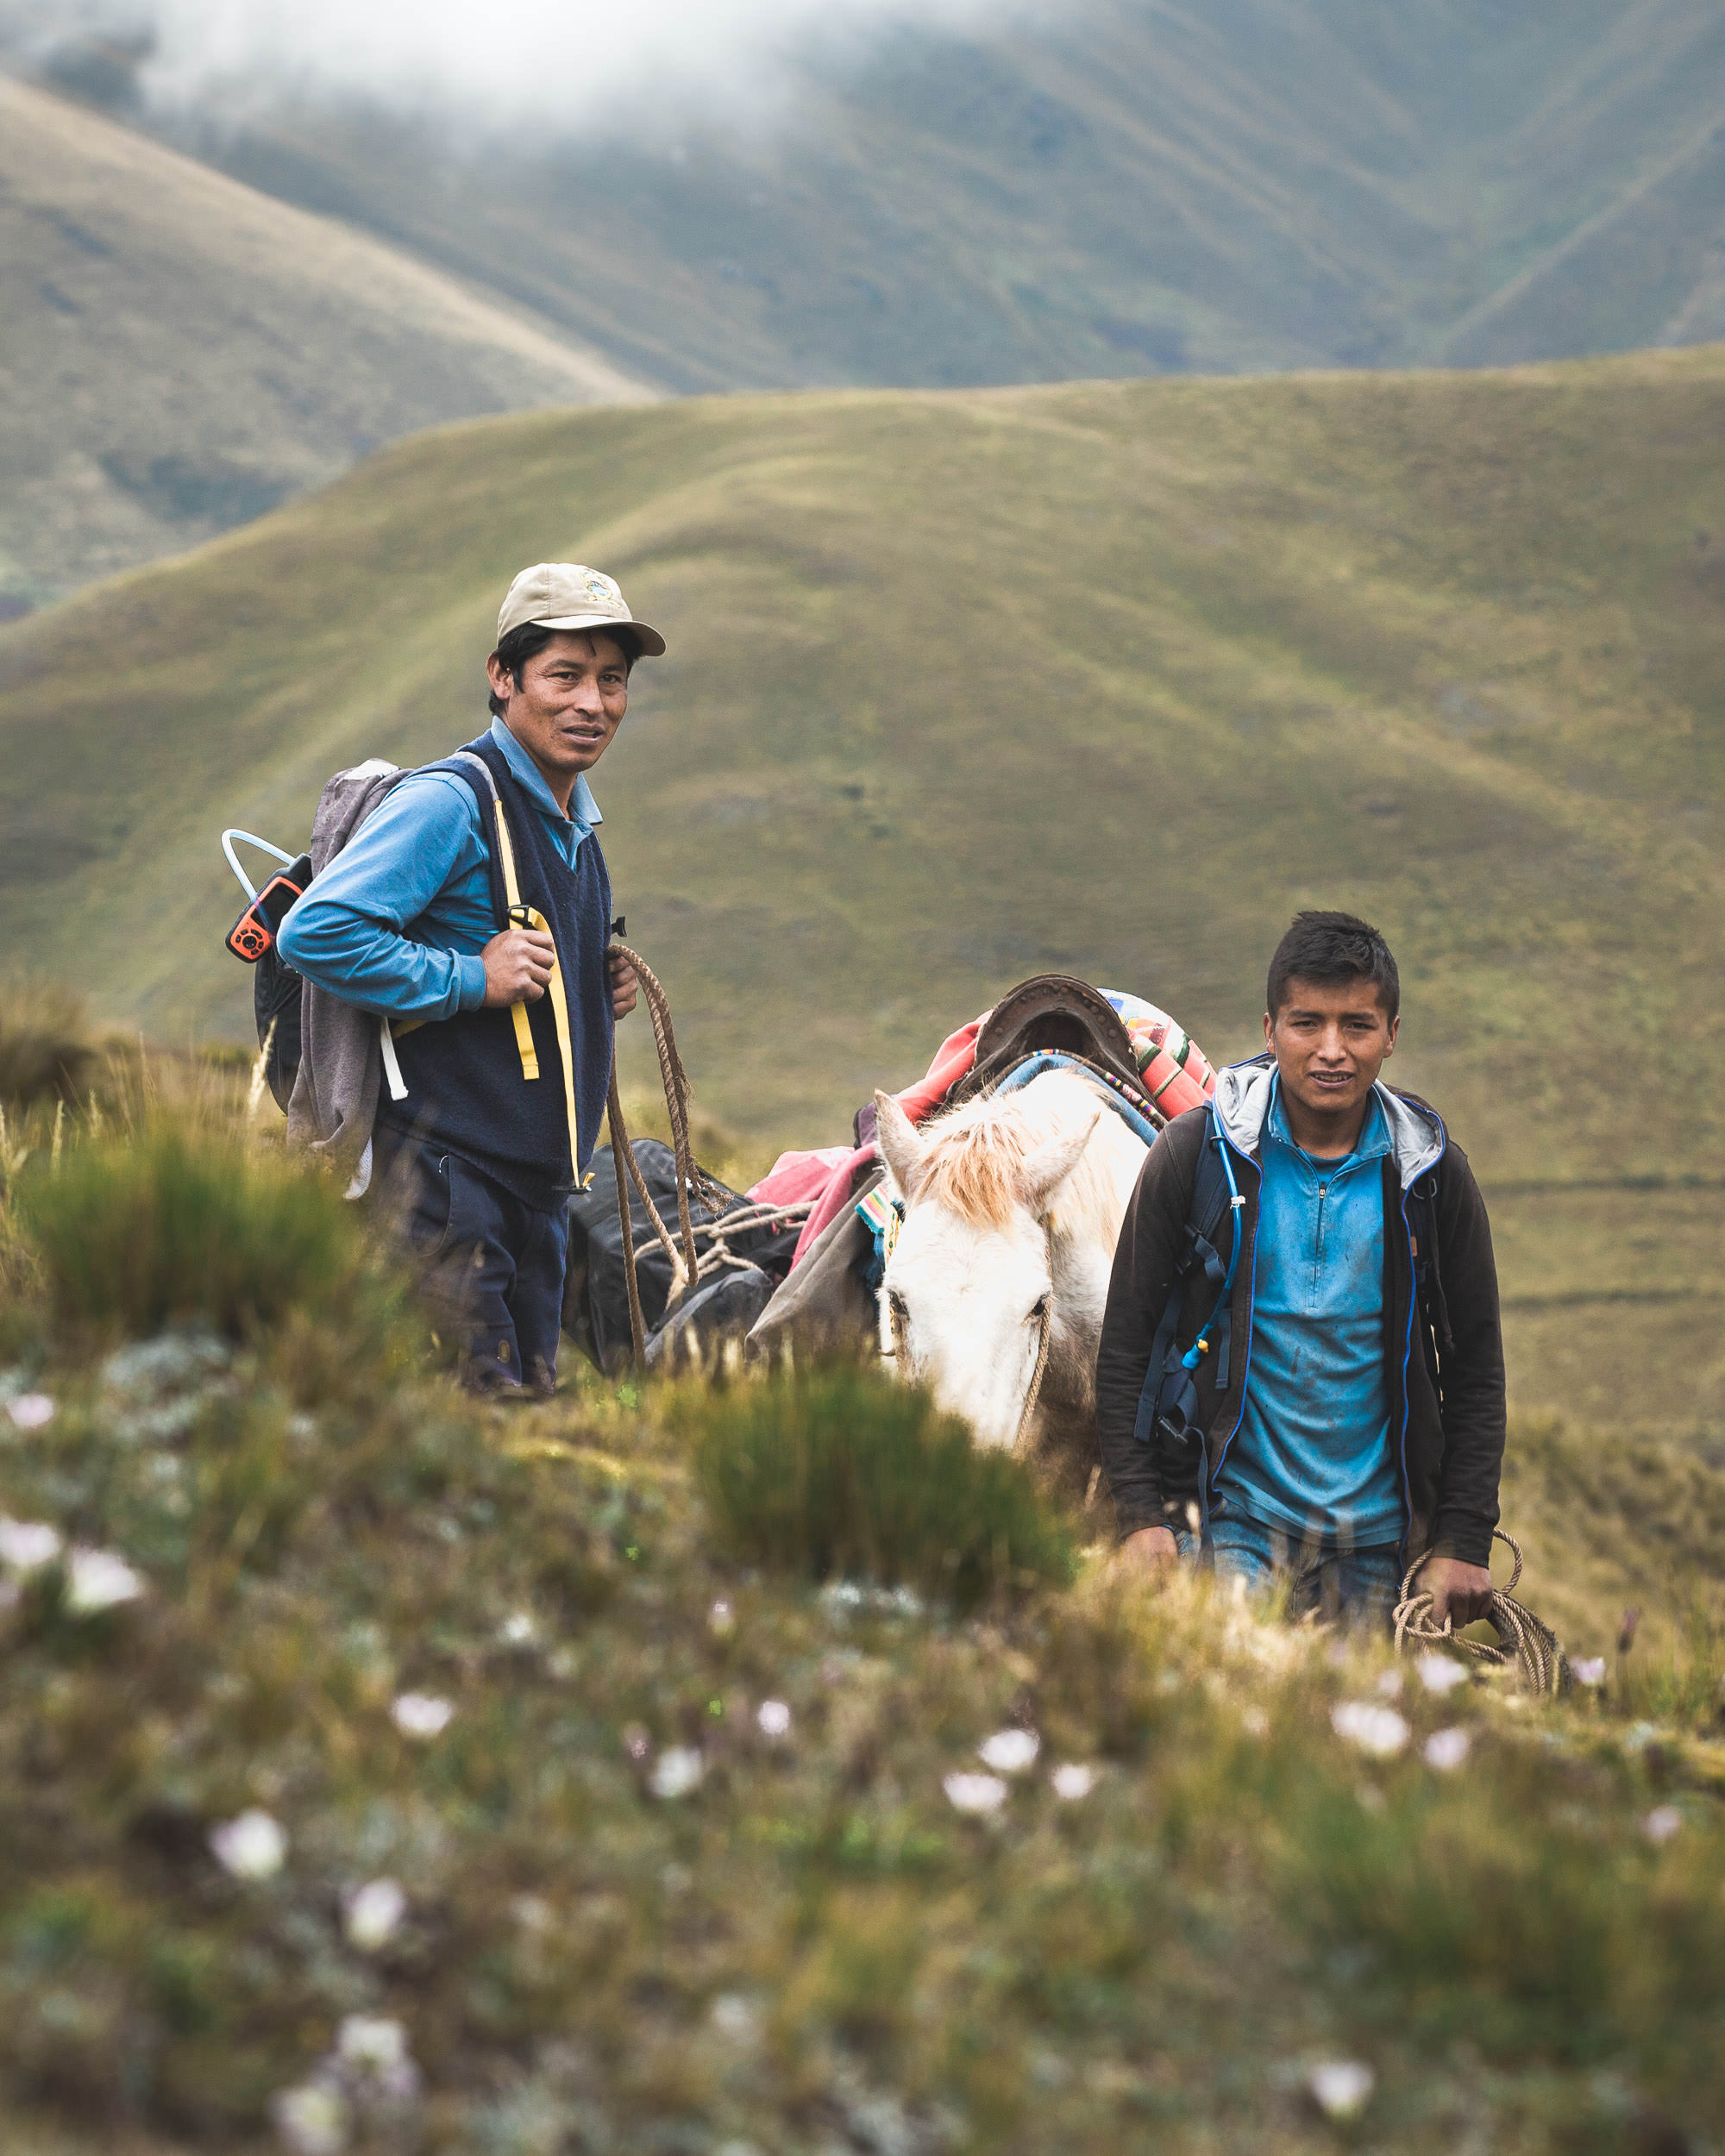 Porters on Trail along Trek to Machu Picchu